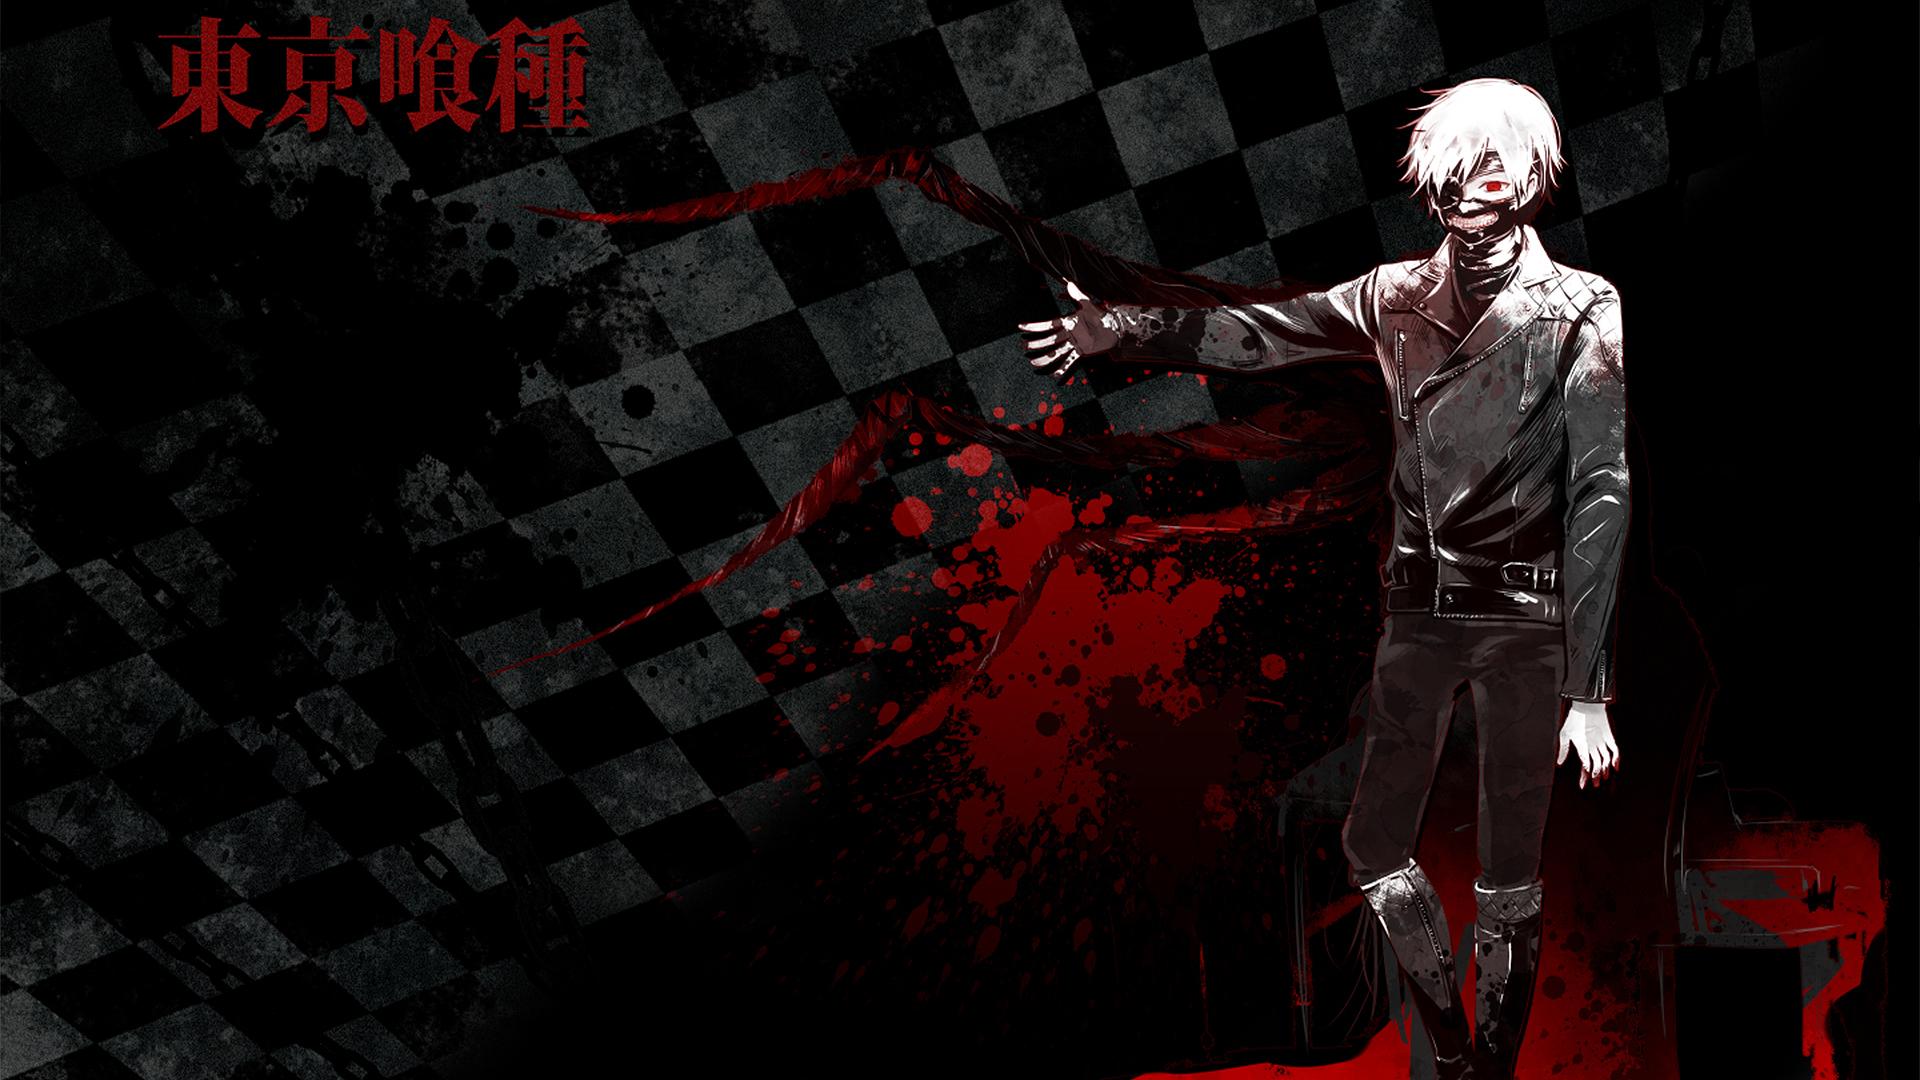 tokyo ghoul wallpaper 1440p - photo #16